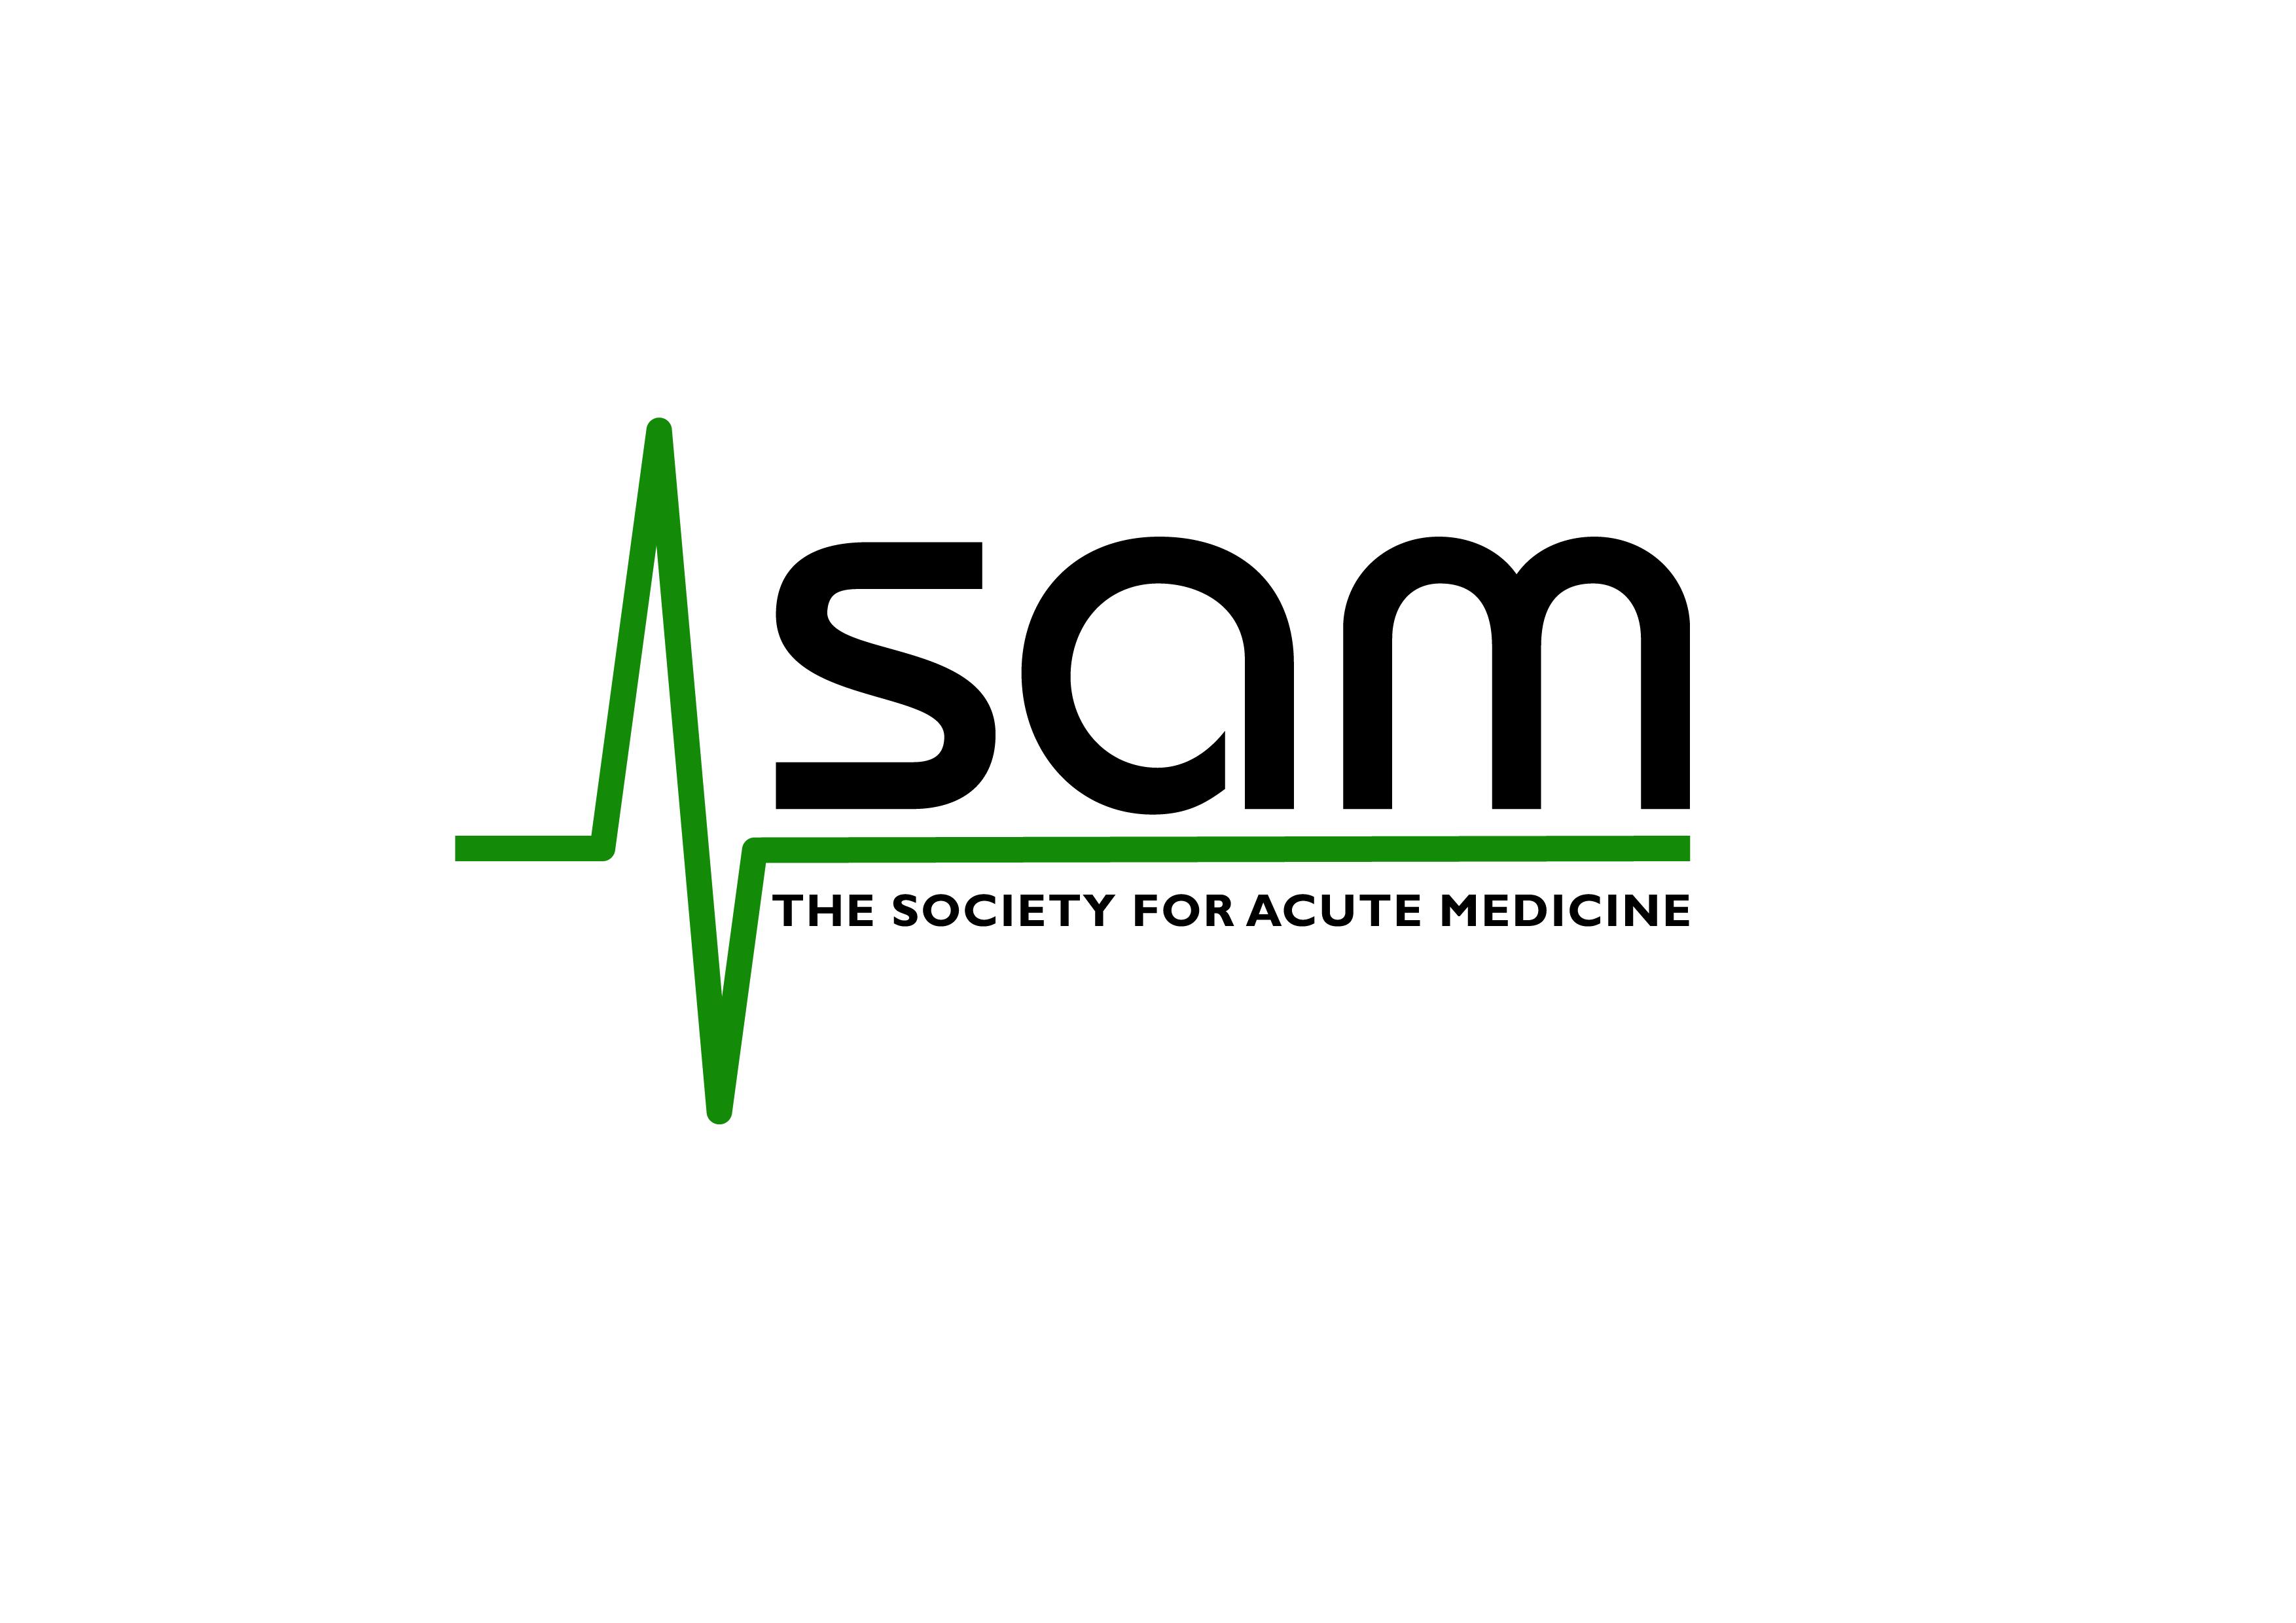 Society for Acute Medicine logo